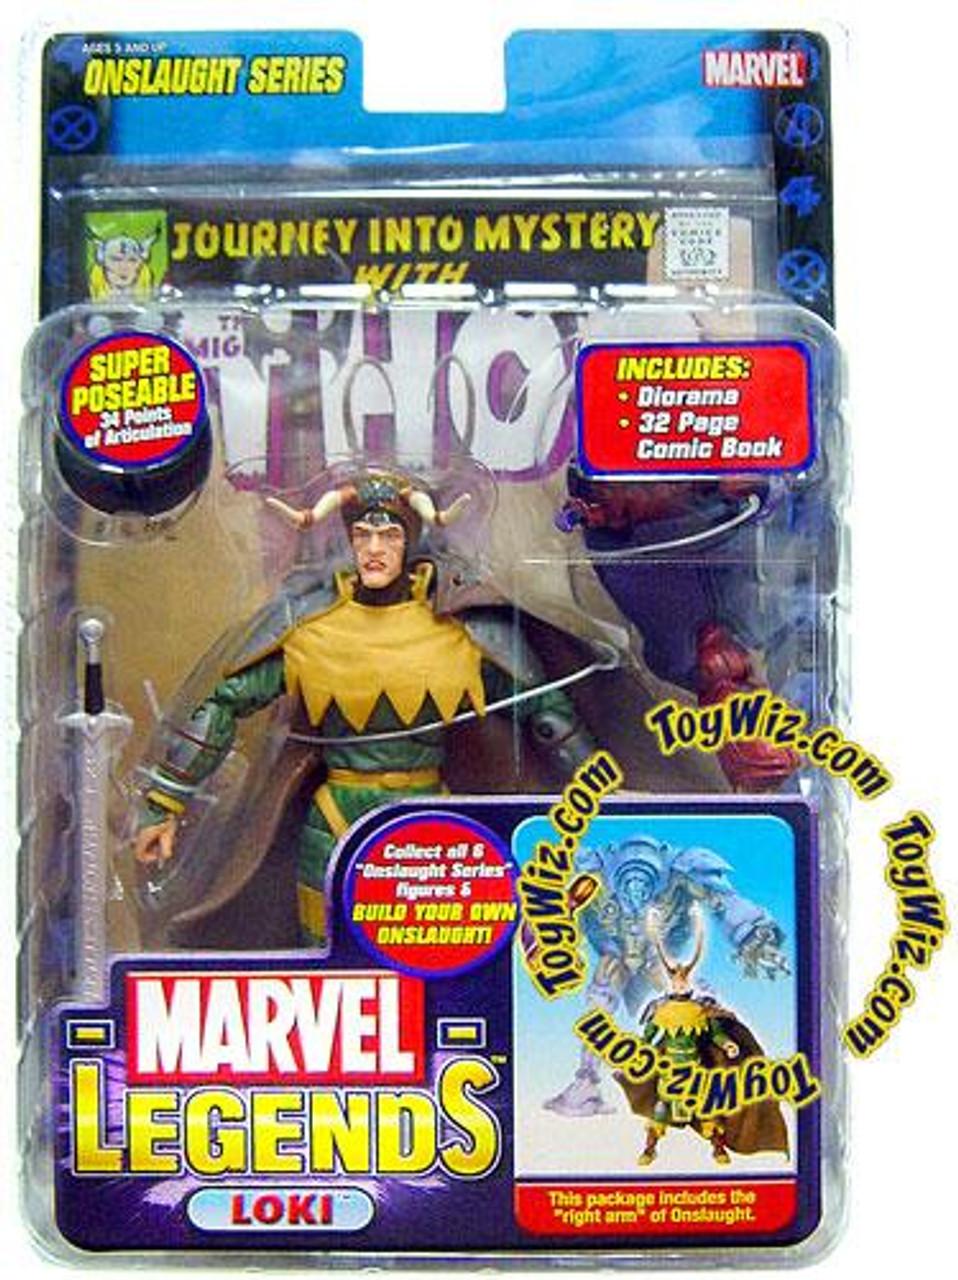 Marvel Legends Series 13 Onslaught Loki Action Figure [Crown of Lies Variant]